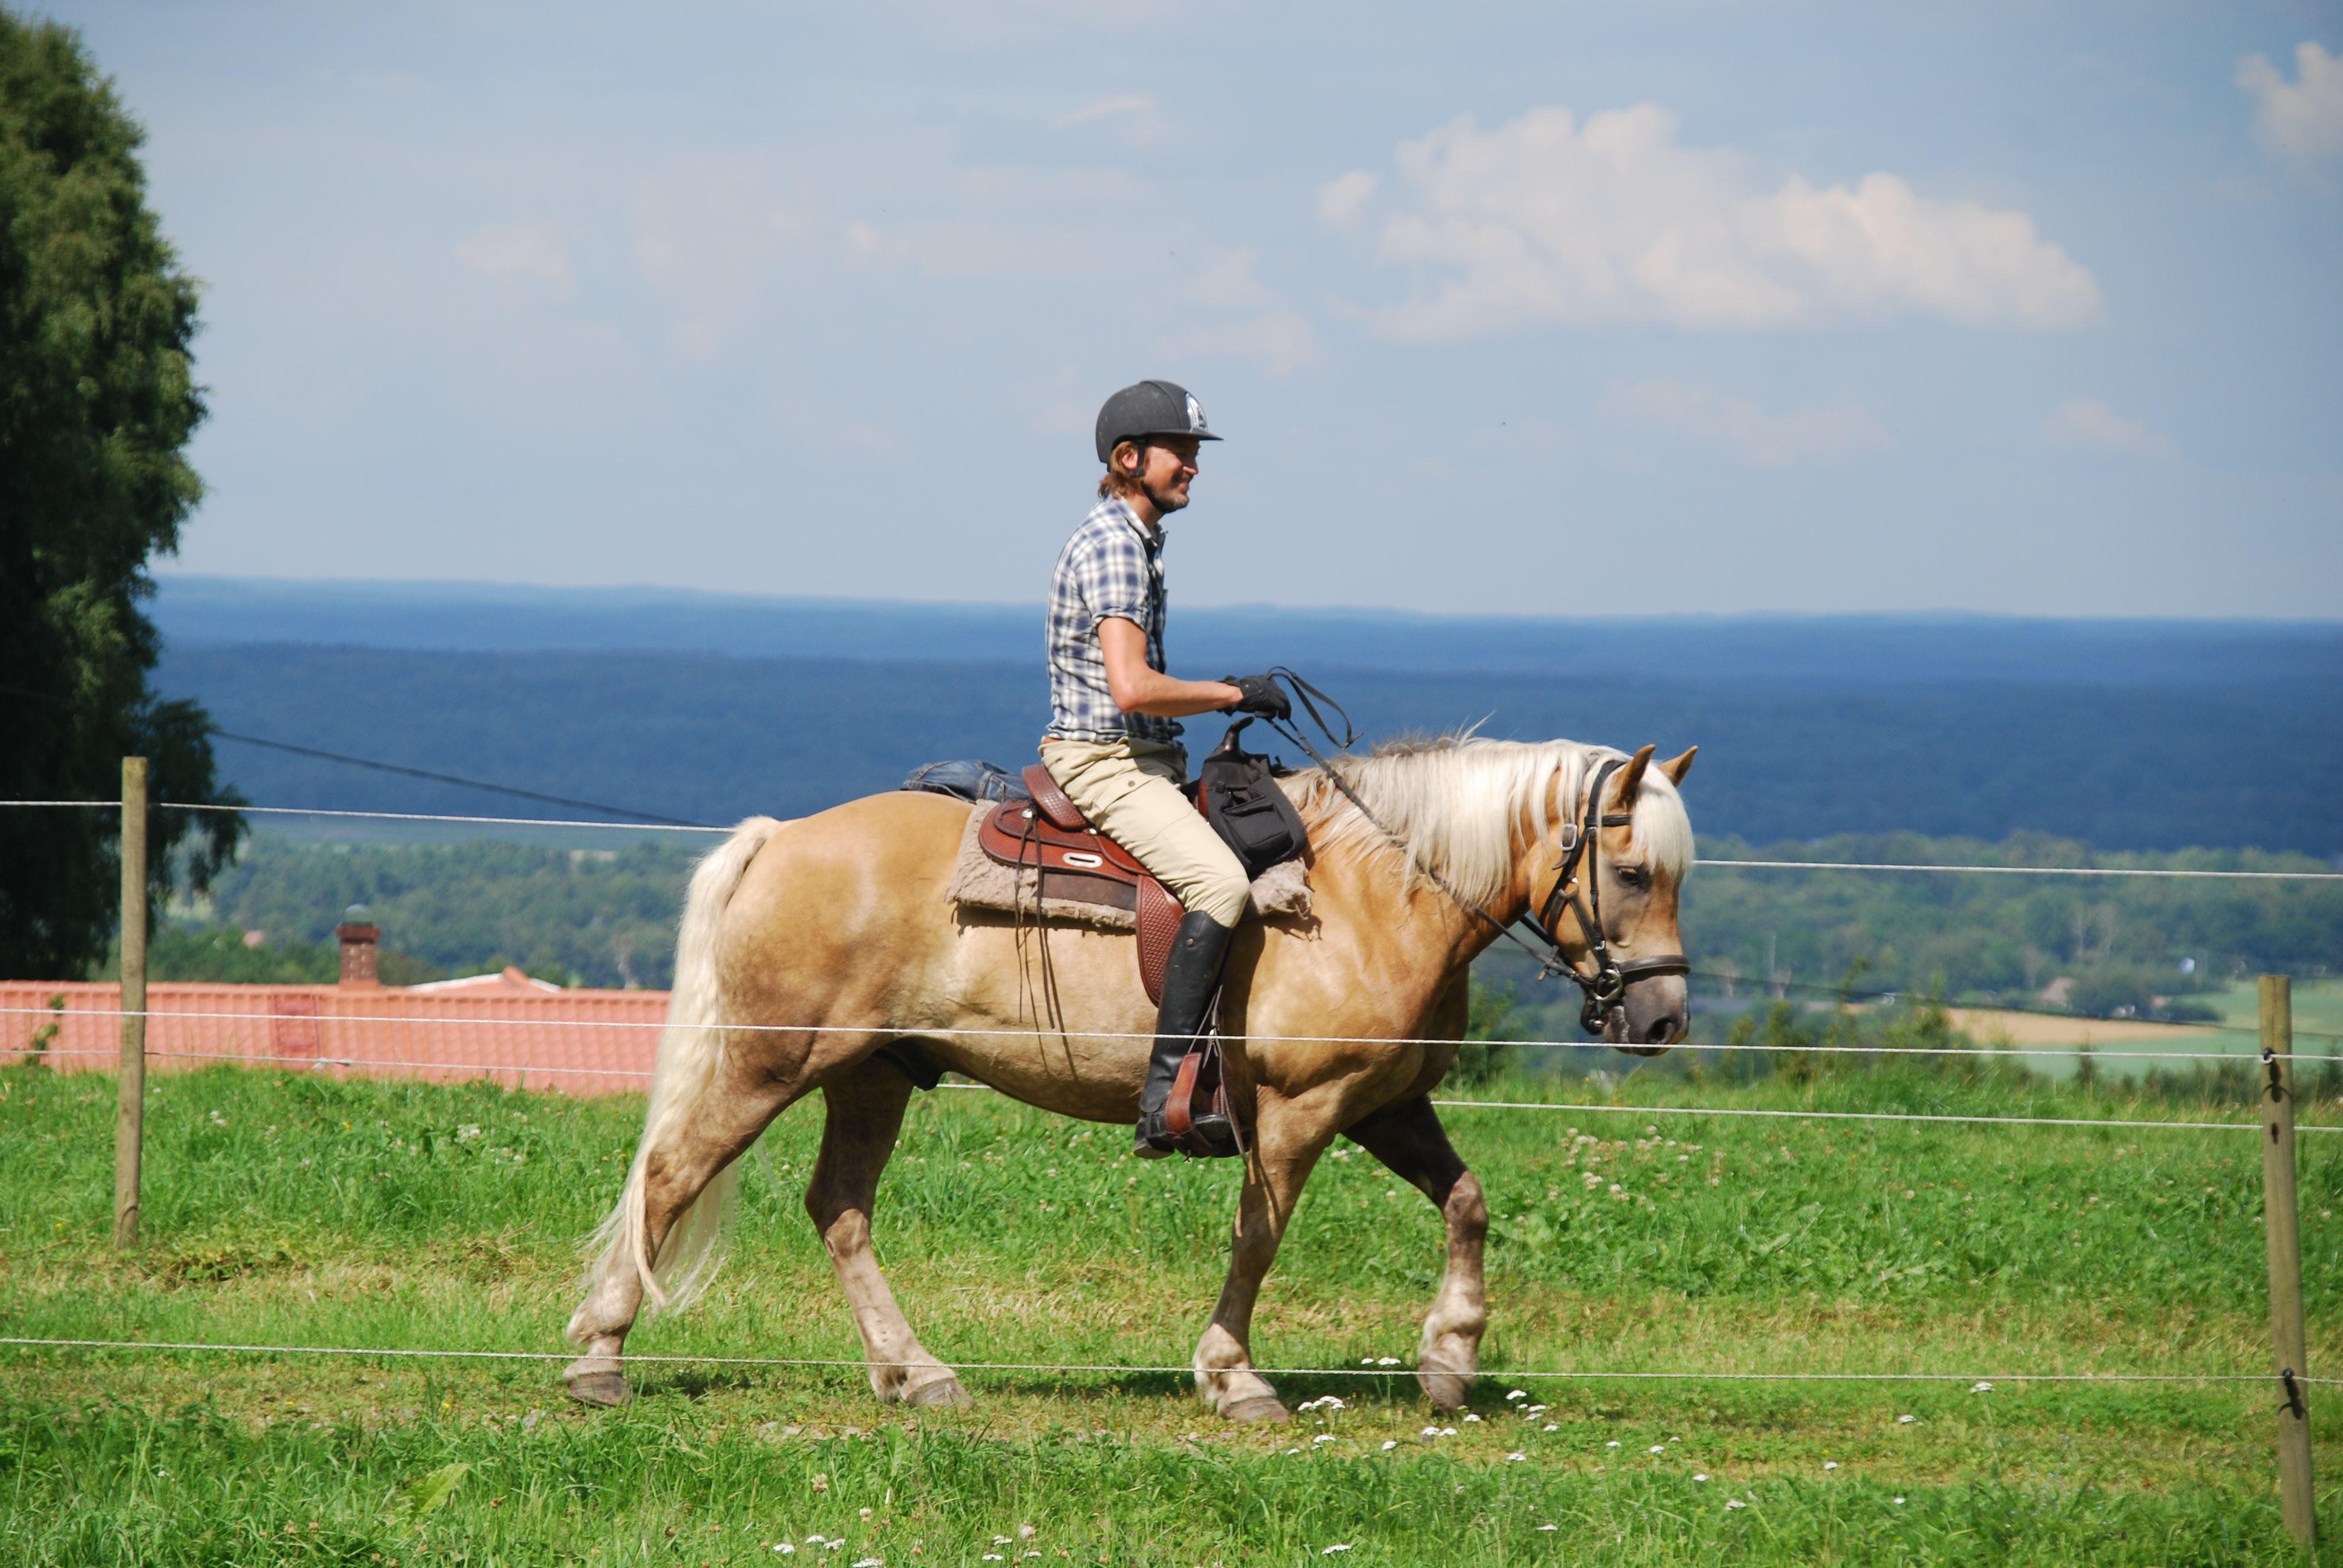 © Anna Lewijn, Söderåsen Pony Trekking